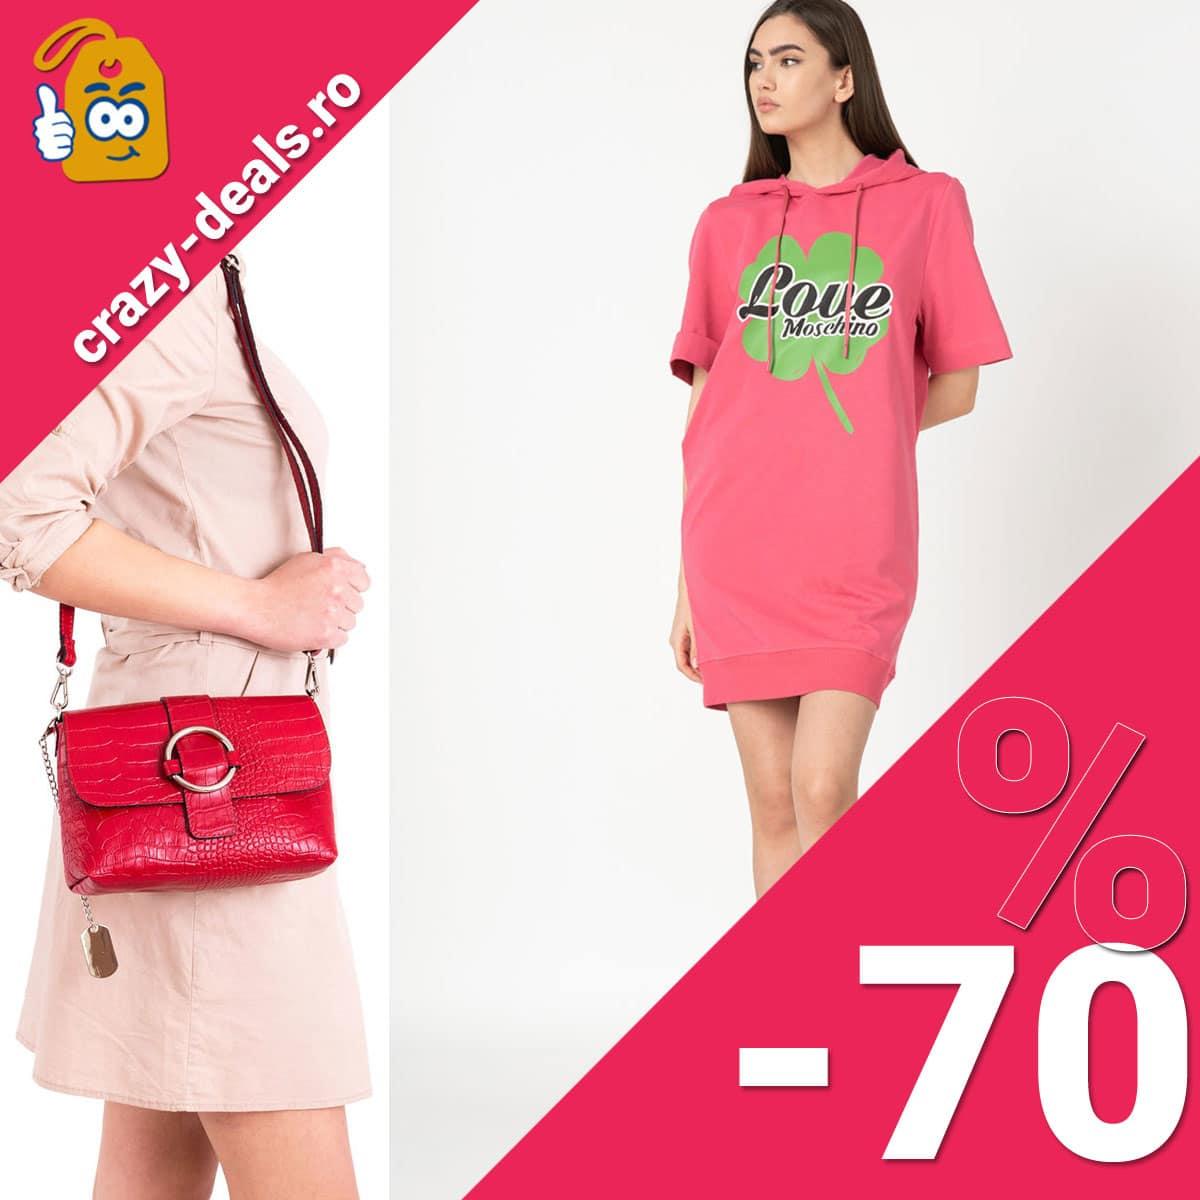 Articole fashion reduse cu pana la 70% pe Fashion Days